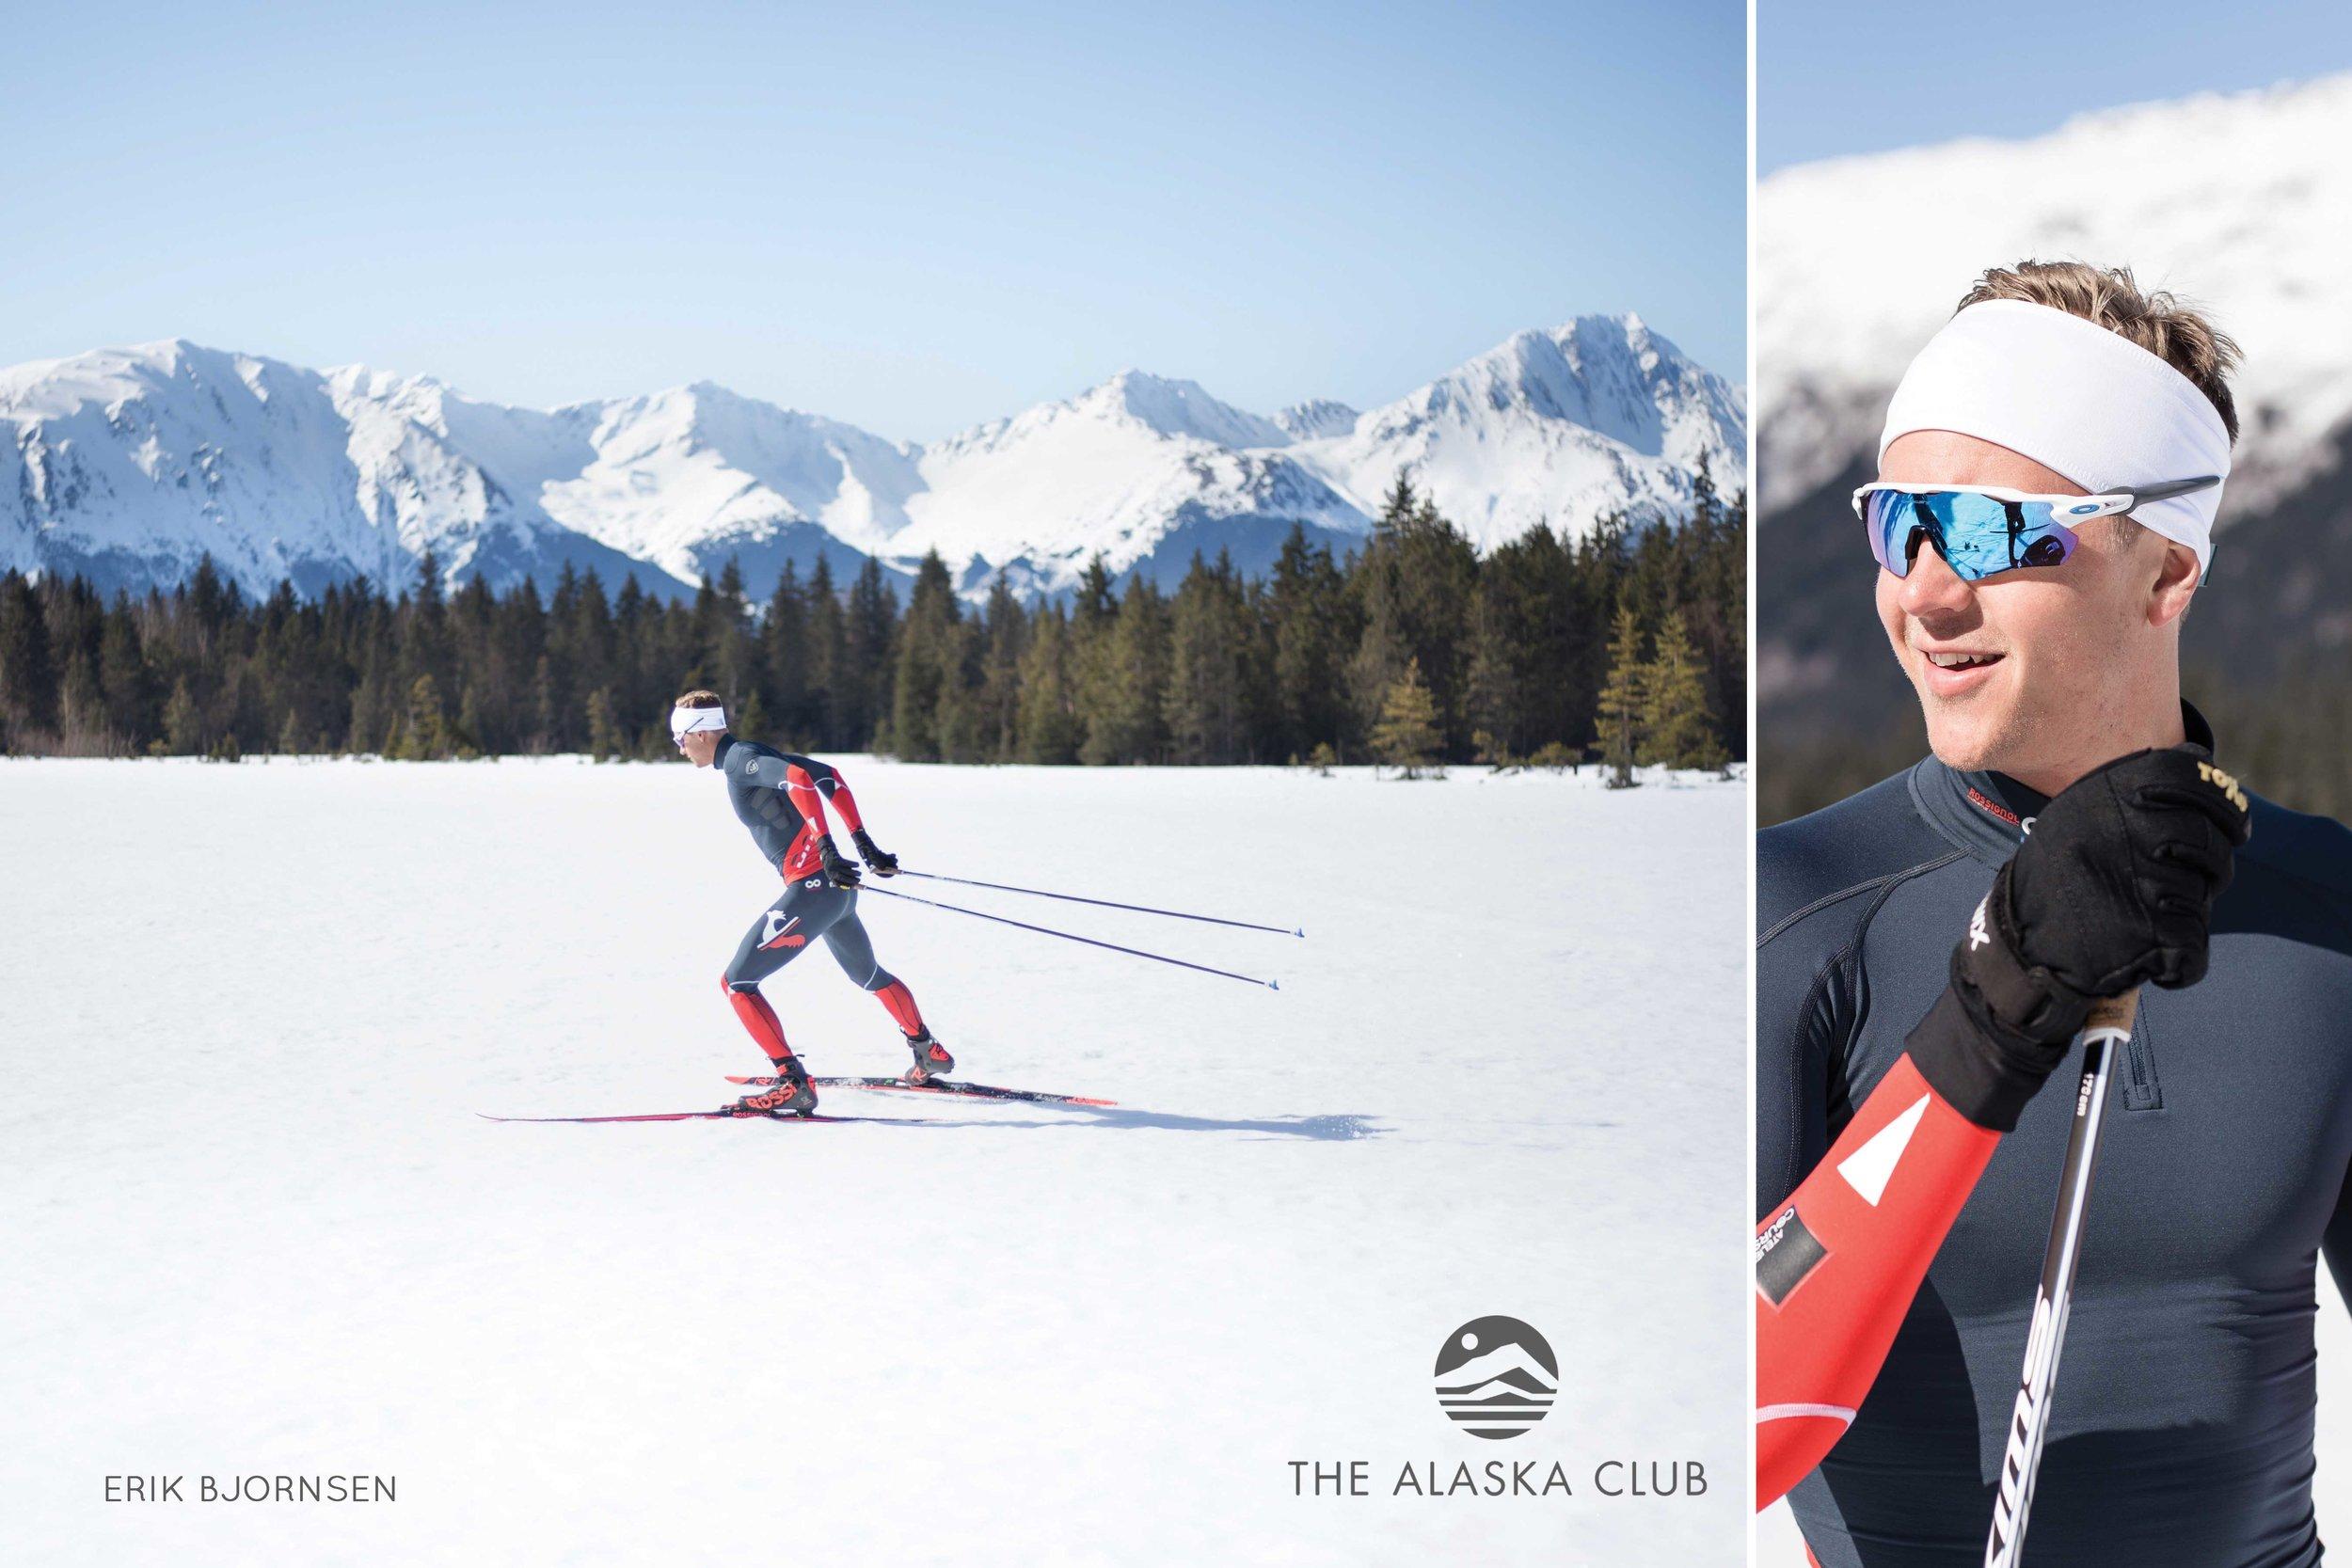 OLYMPIAN TELLS US HOW HE DOES IT ALL - Erik Bjornsen trains like an animal but still enjoys his summer.